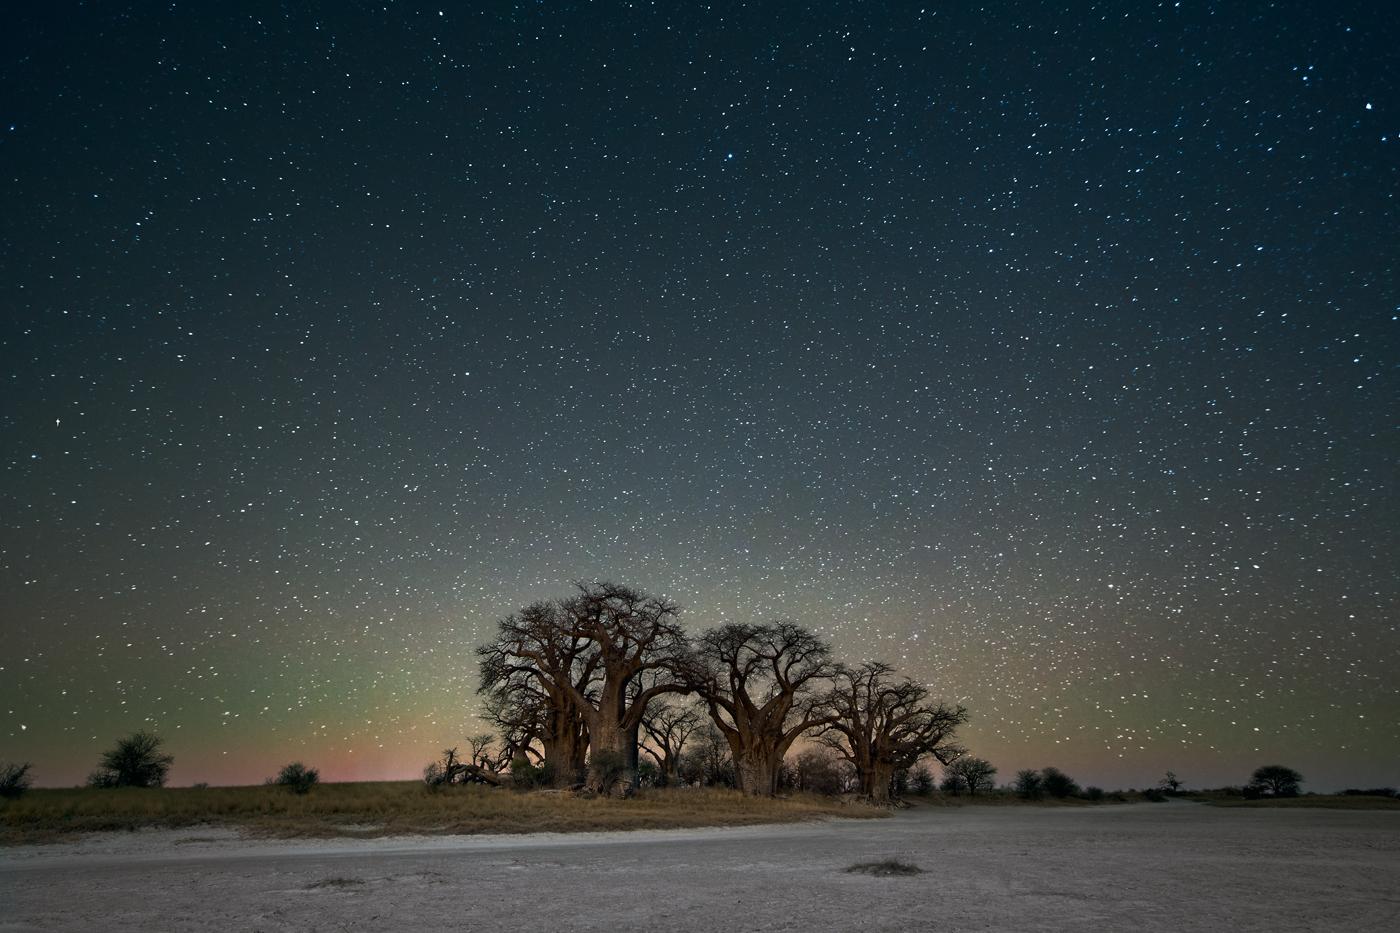 beth-moon-vieu-arbre-etoile-07